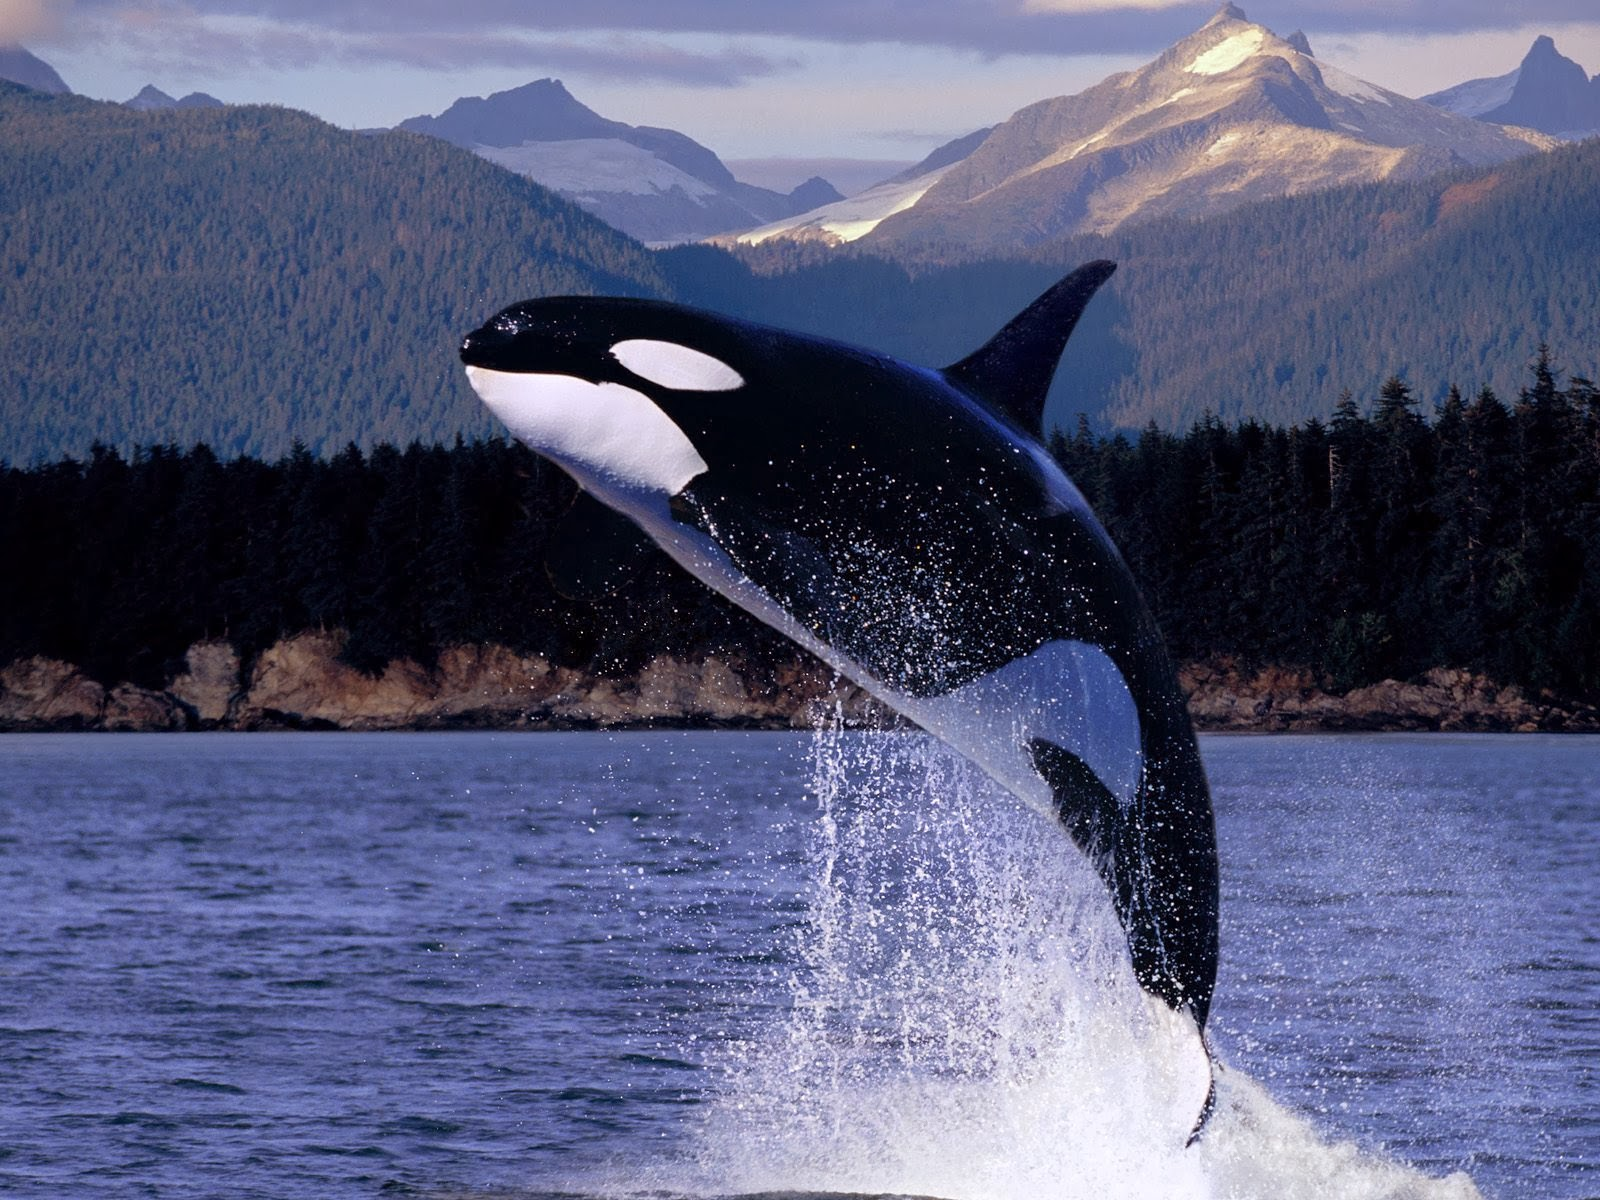 http://beautifulwallpapersfordesktop.blogspot.com/2014/01/beautiful-water-animals-wallpapers.html